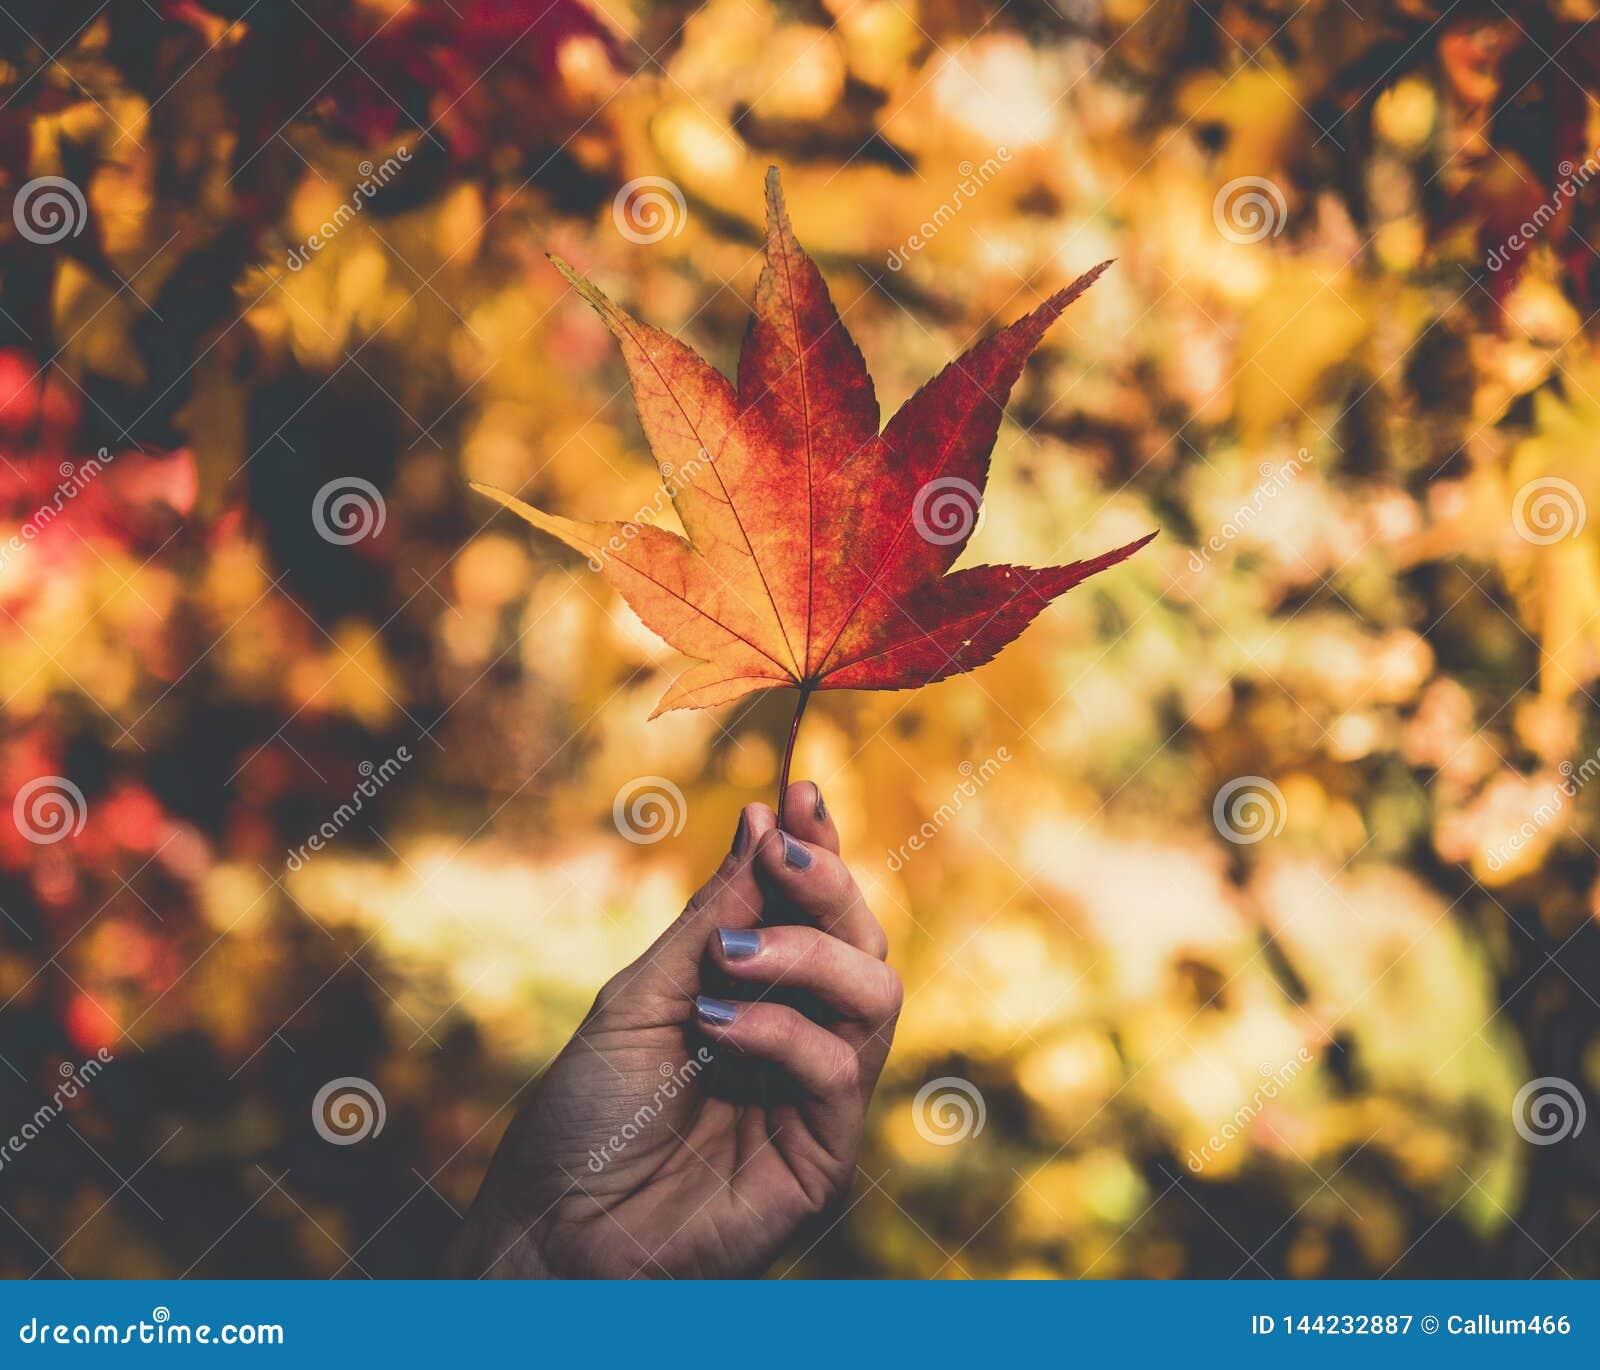 Isolated leaf maple